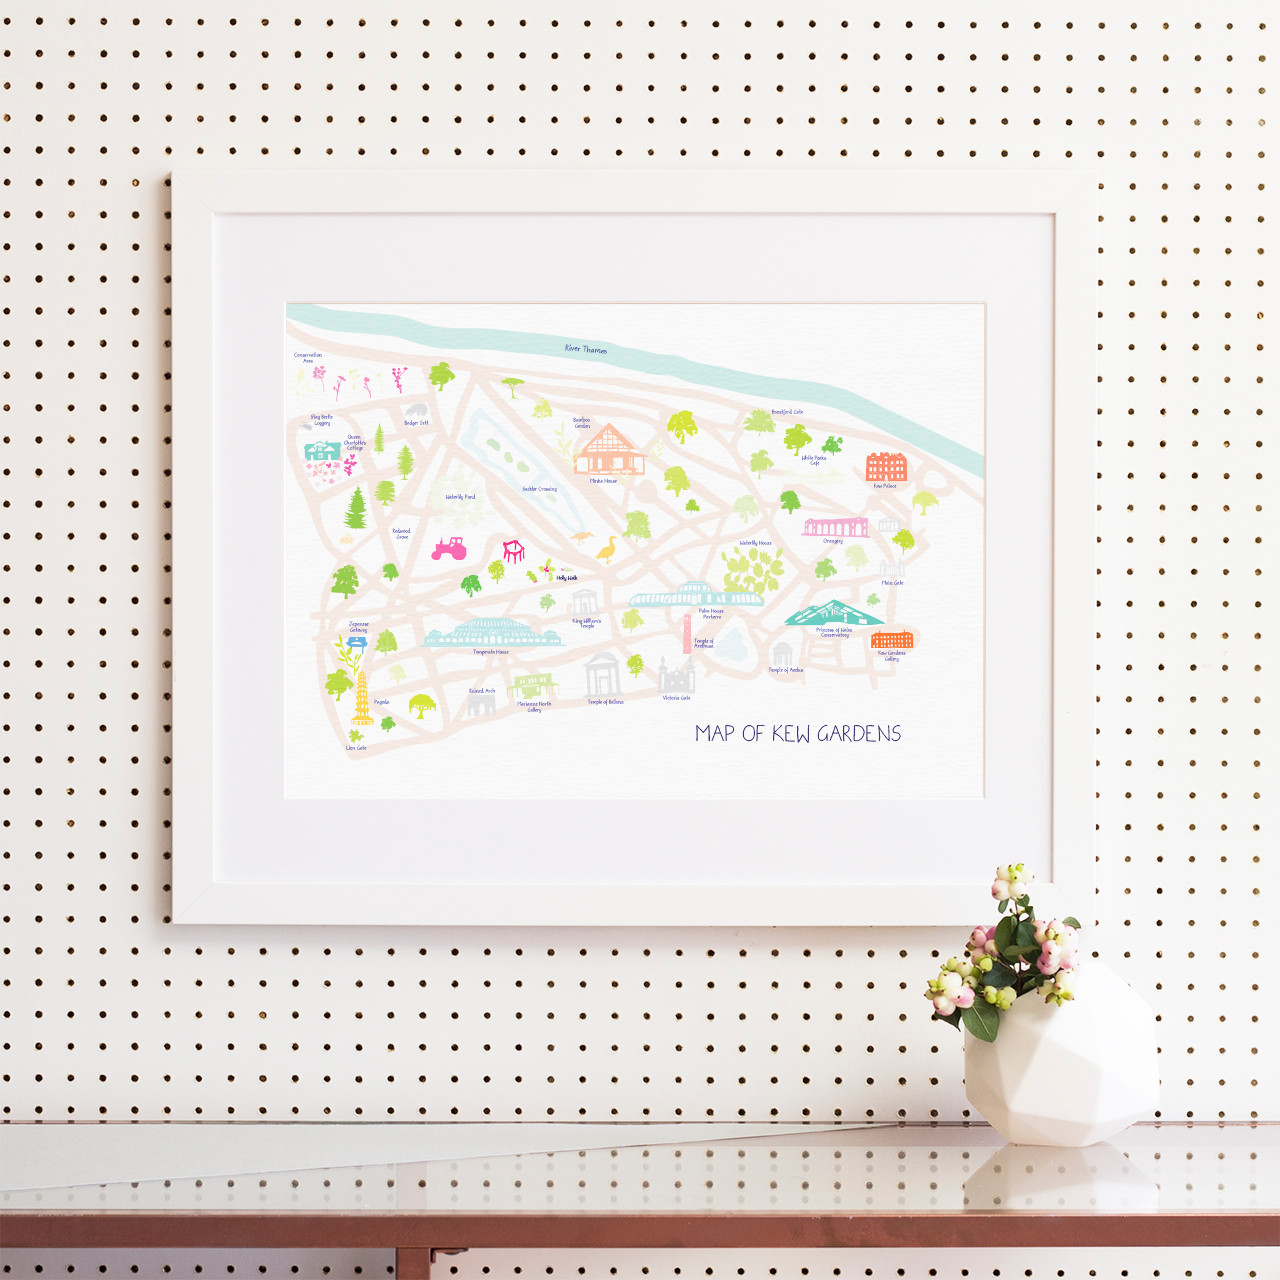 Map of Kew Gardens Art Print (Various Sizes) - Holly Francesca